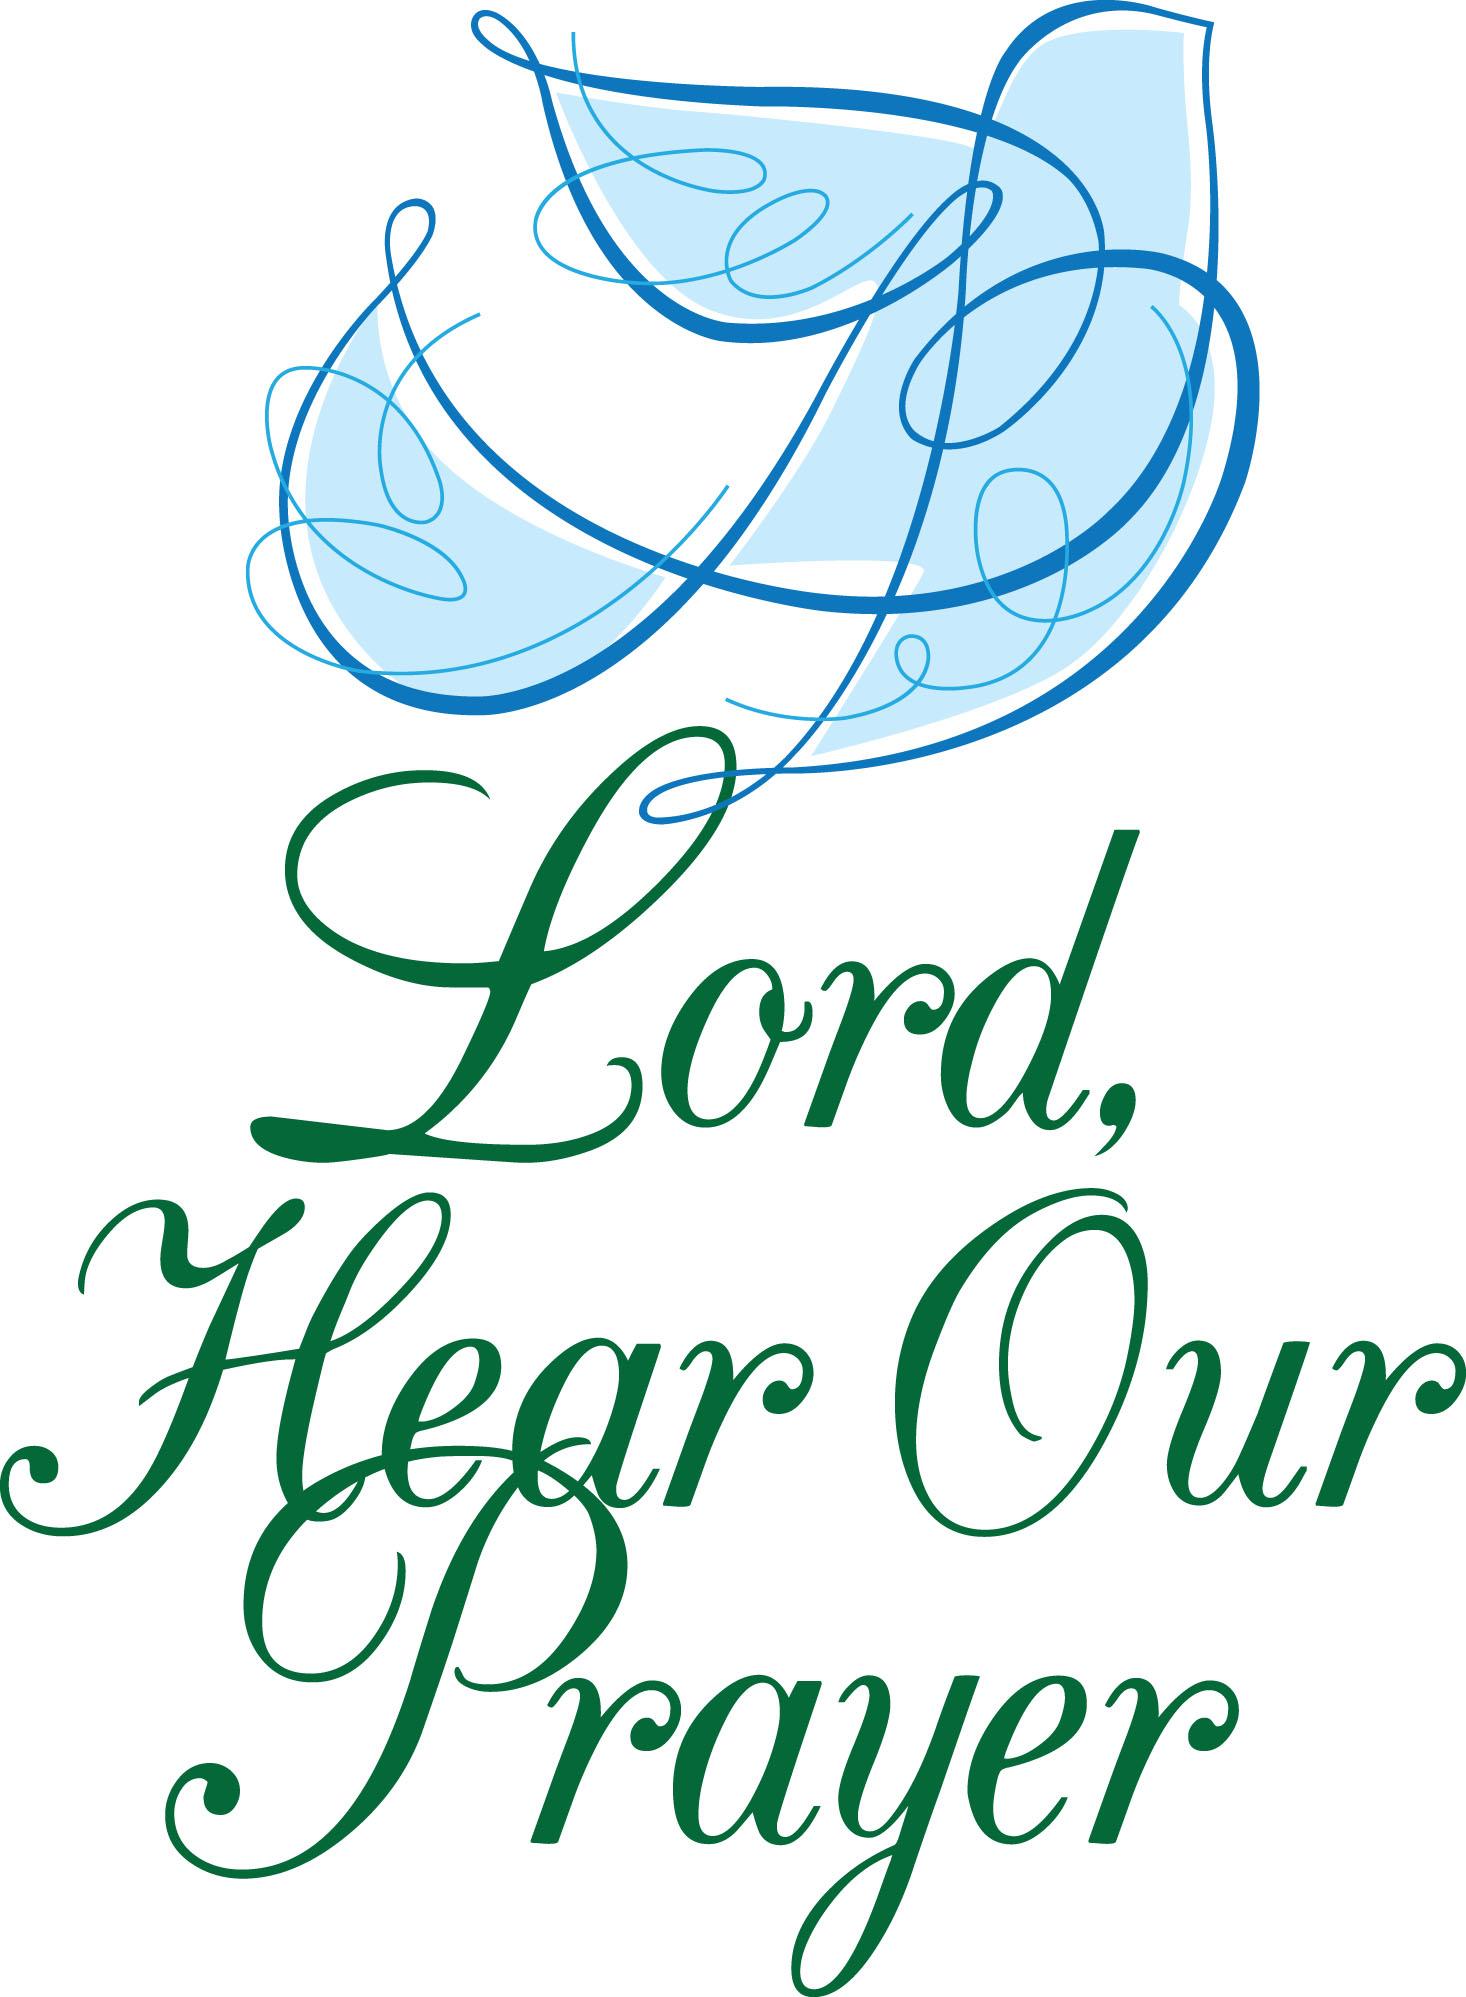 Evening Prayer -...Free Clip Art Of Church On Wednesday